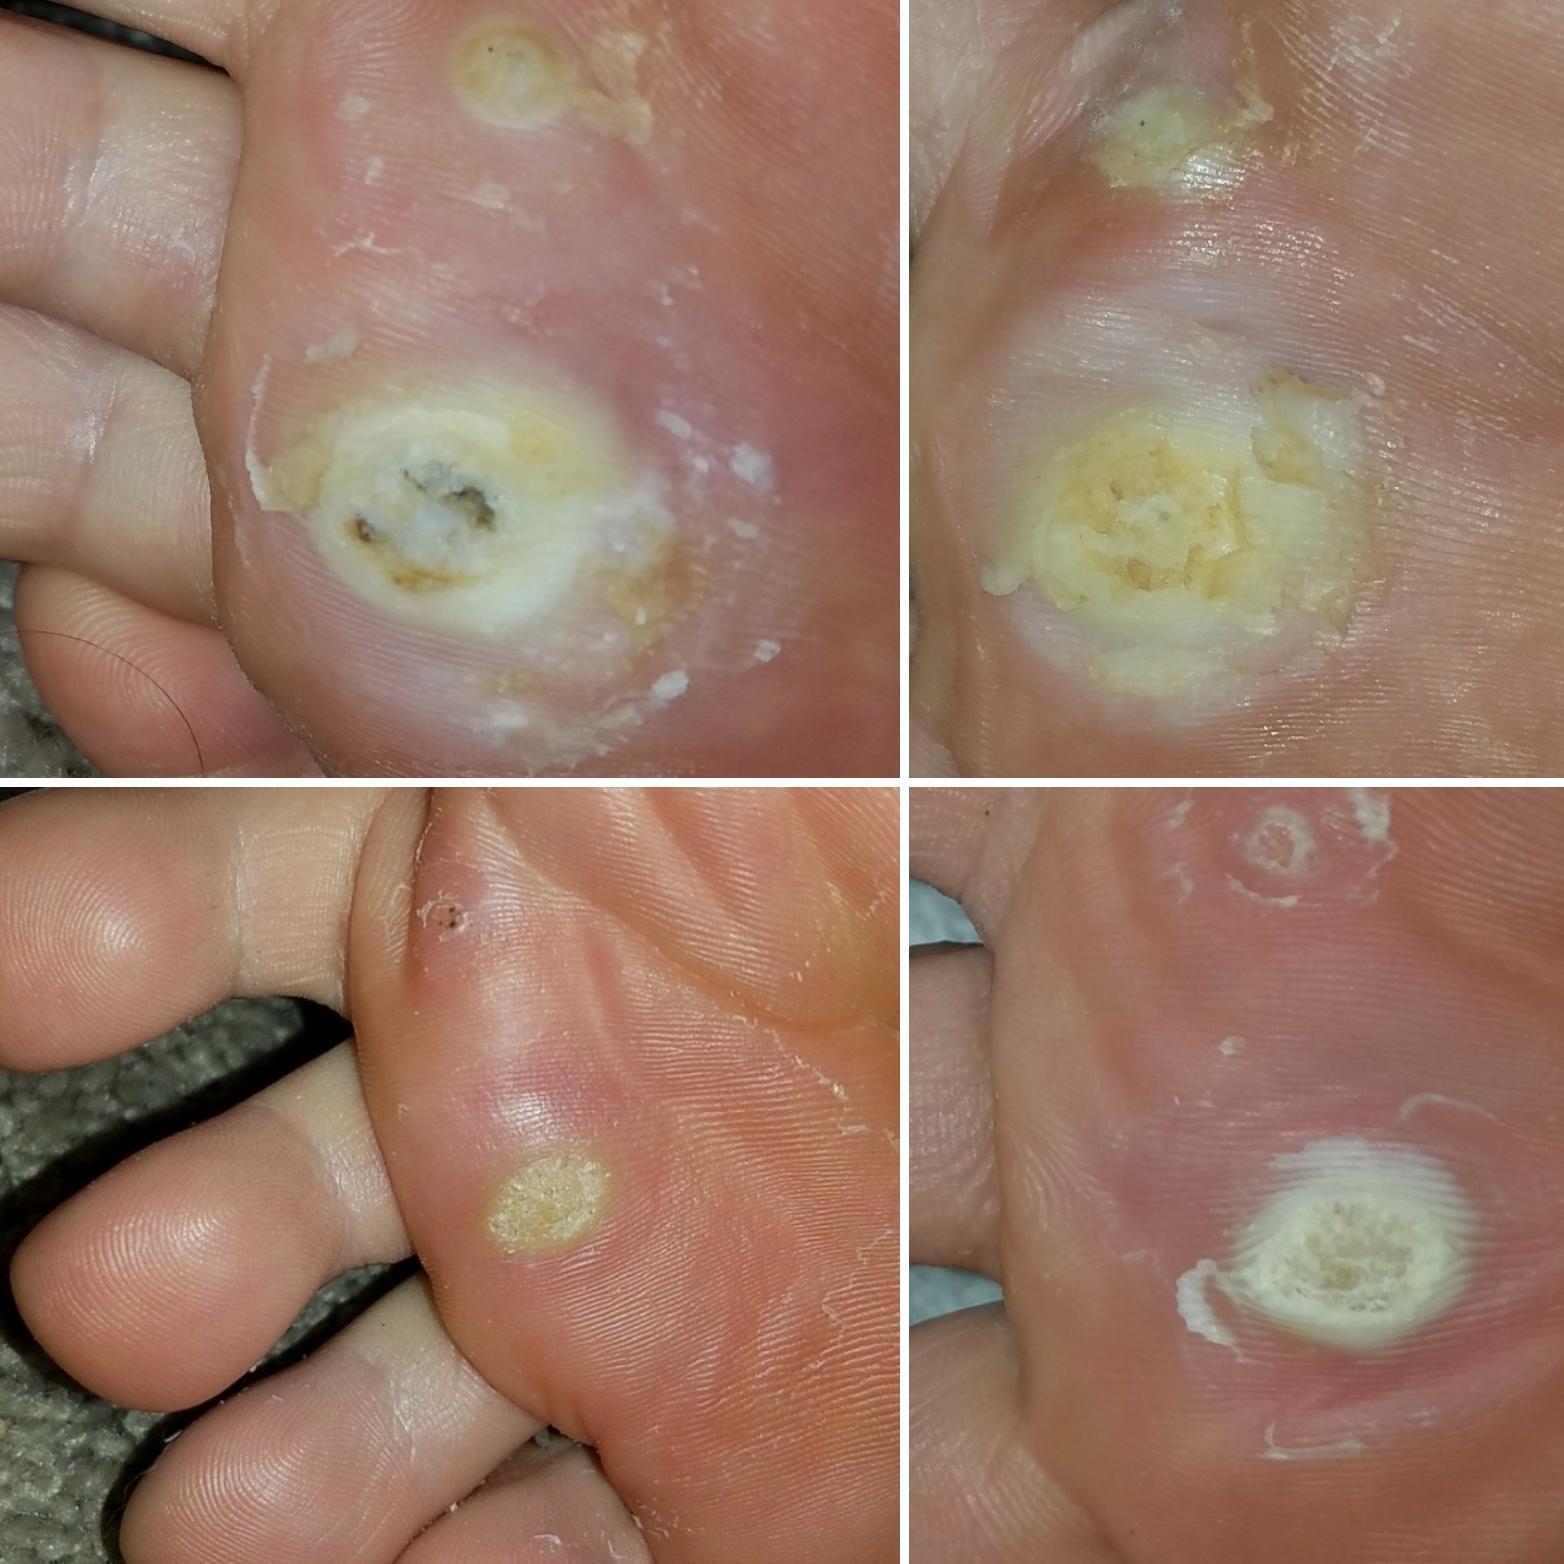 wart on foot throbbing medicamente pentru paraziti intestinali copii